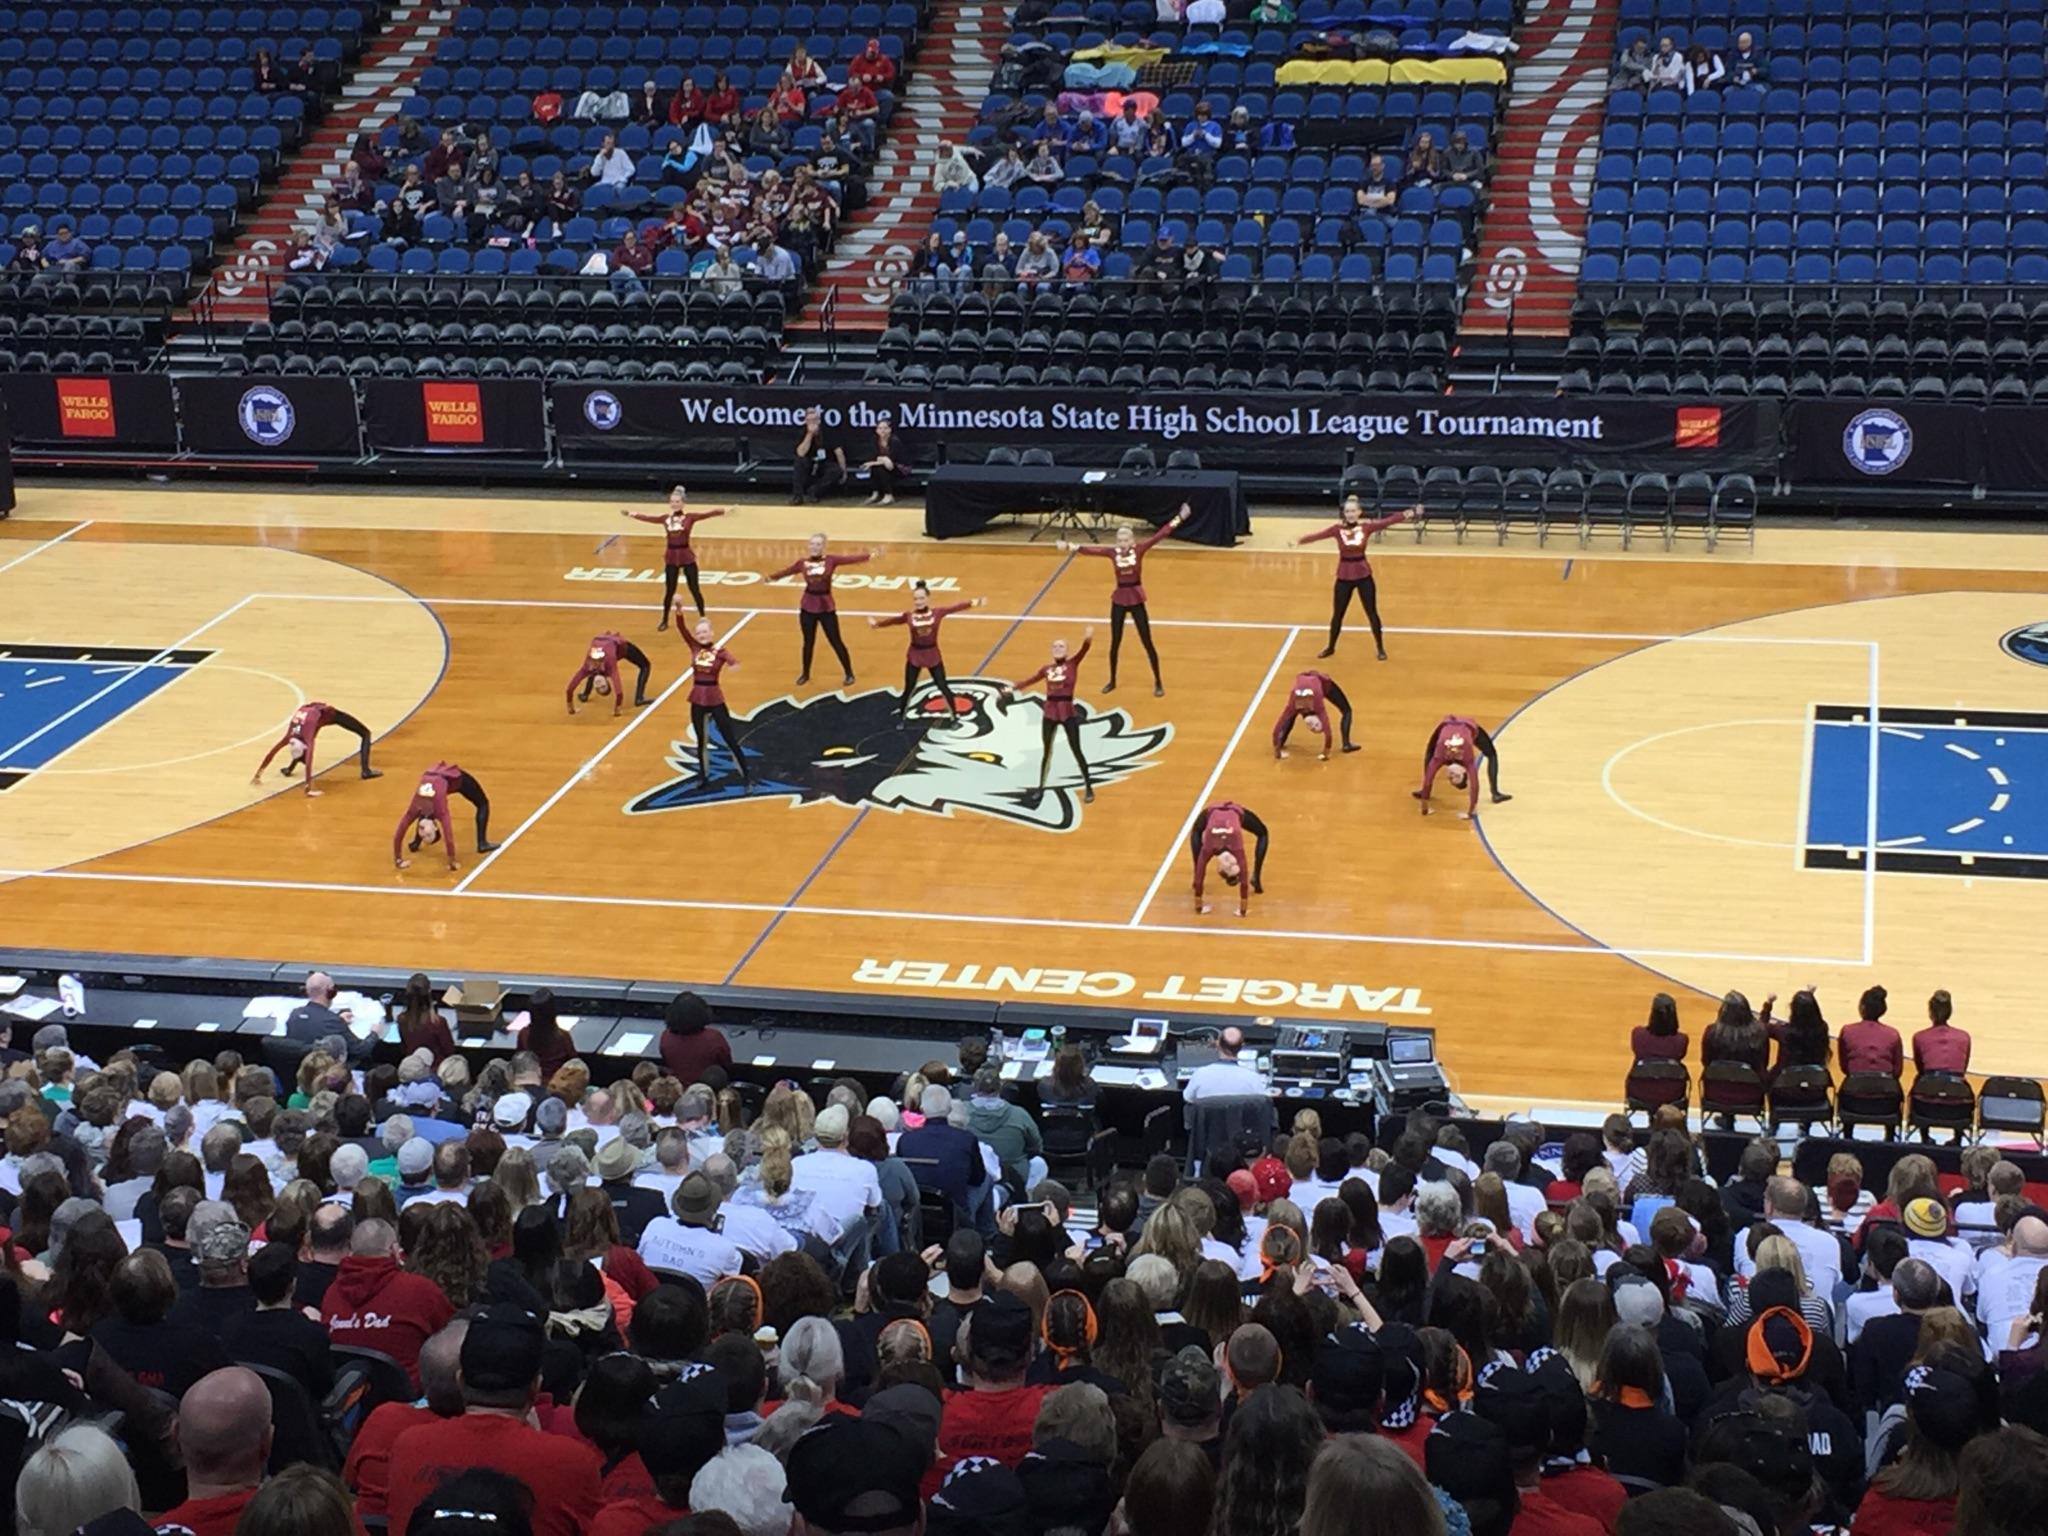 Minnesota High School Dance Team Online » St. Charles